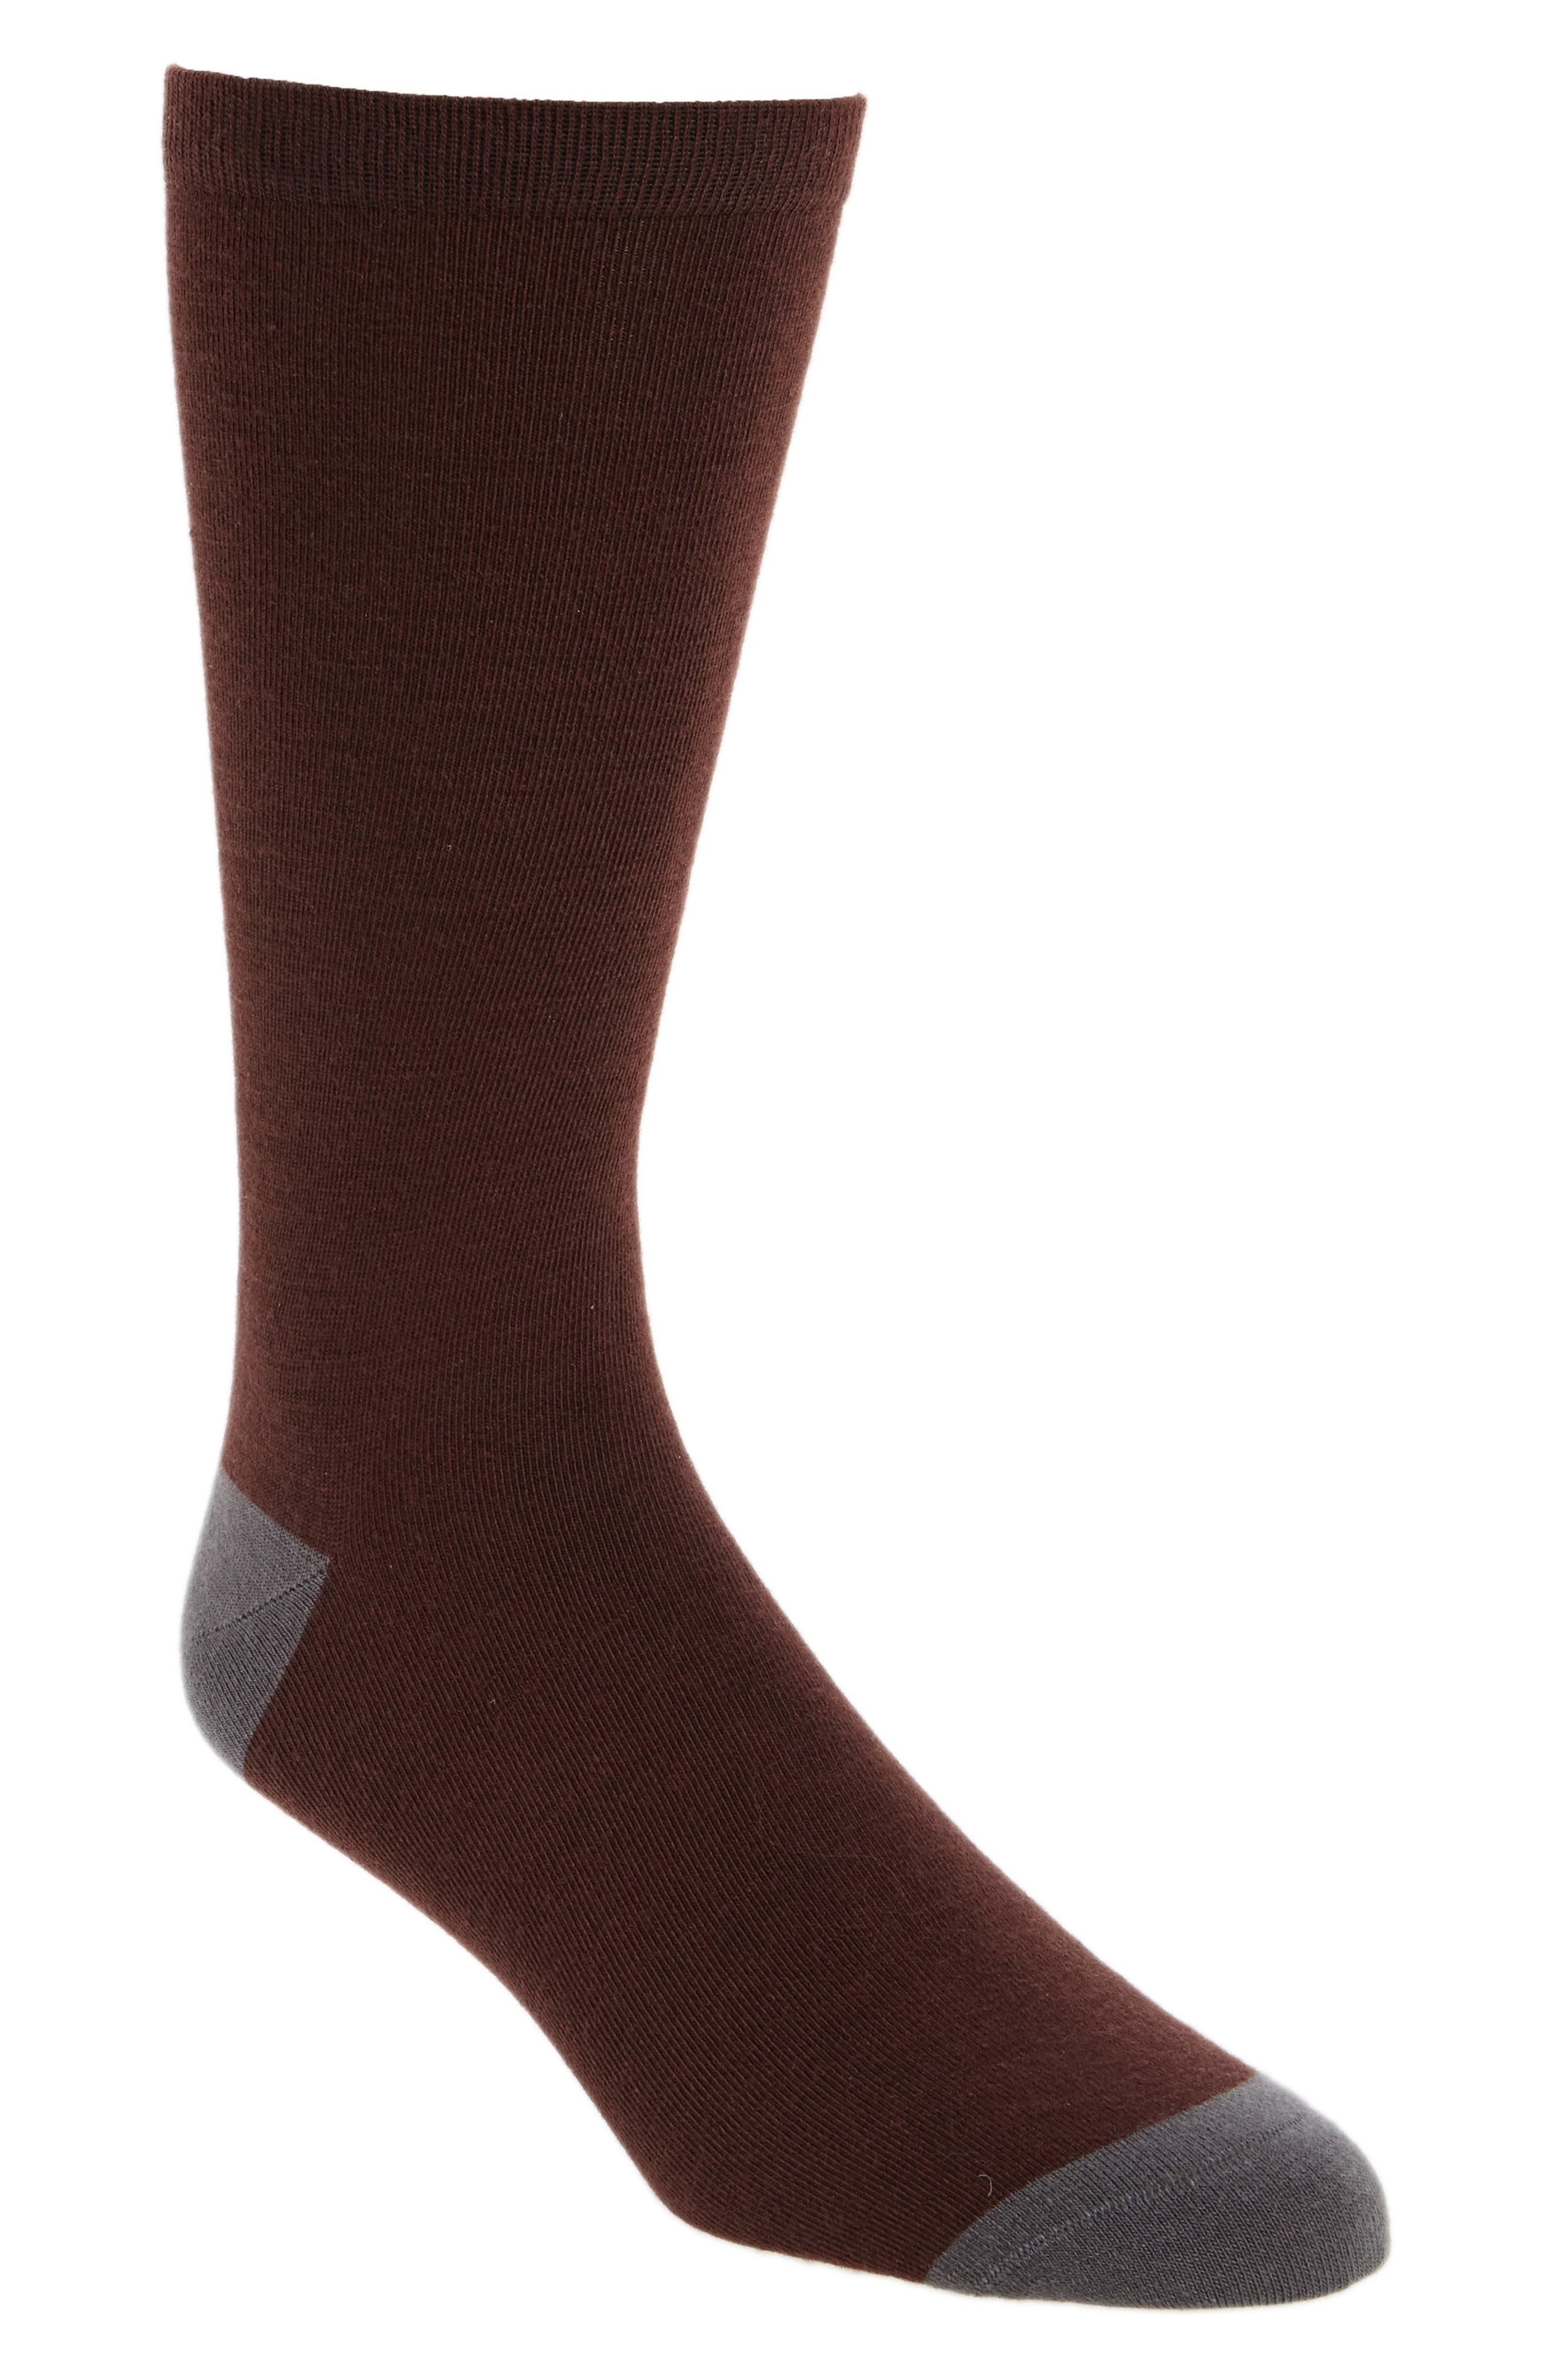 Colorblock Socks,                             Main thumbnail 3, color,